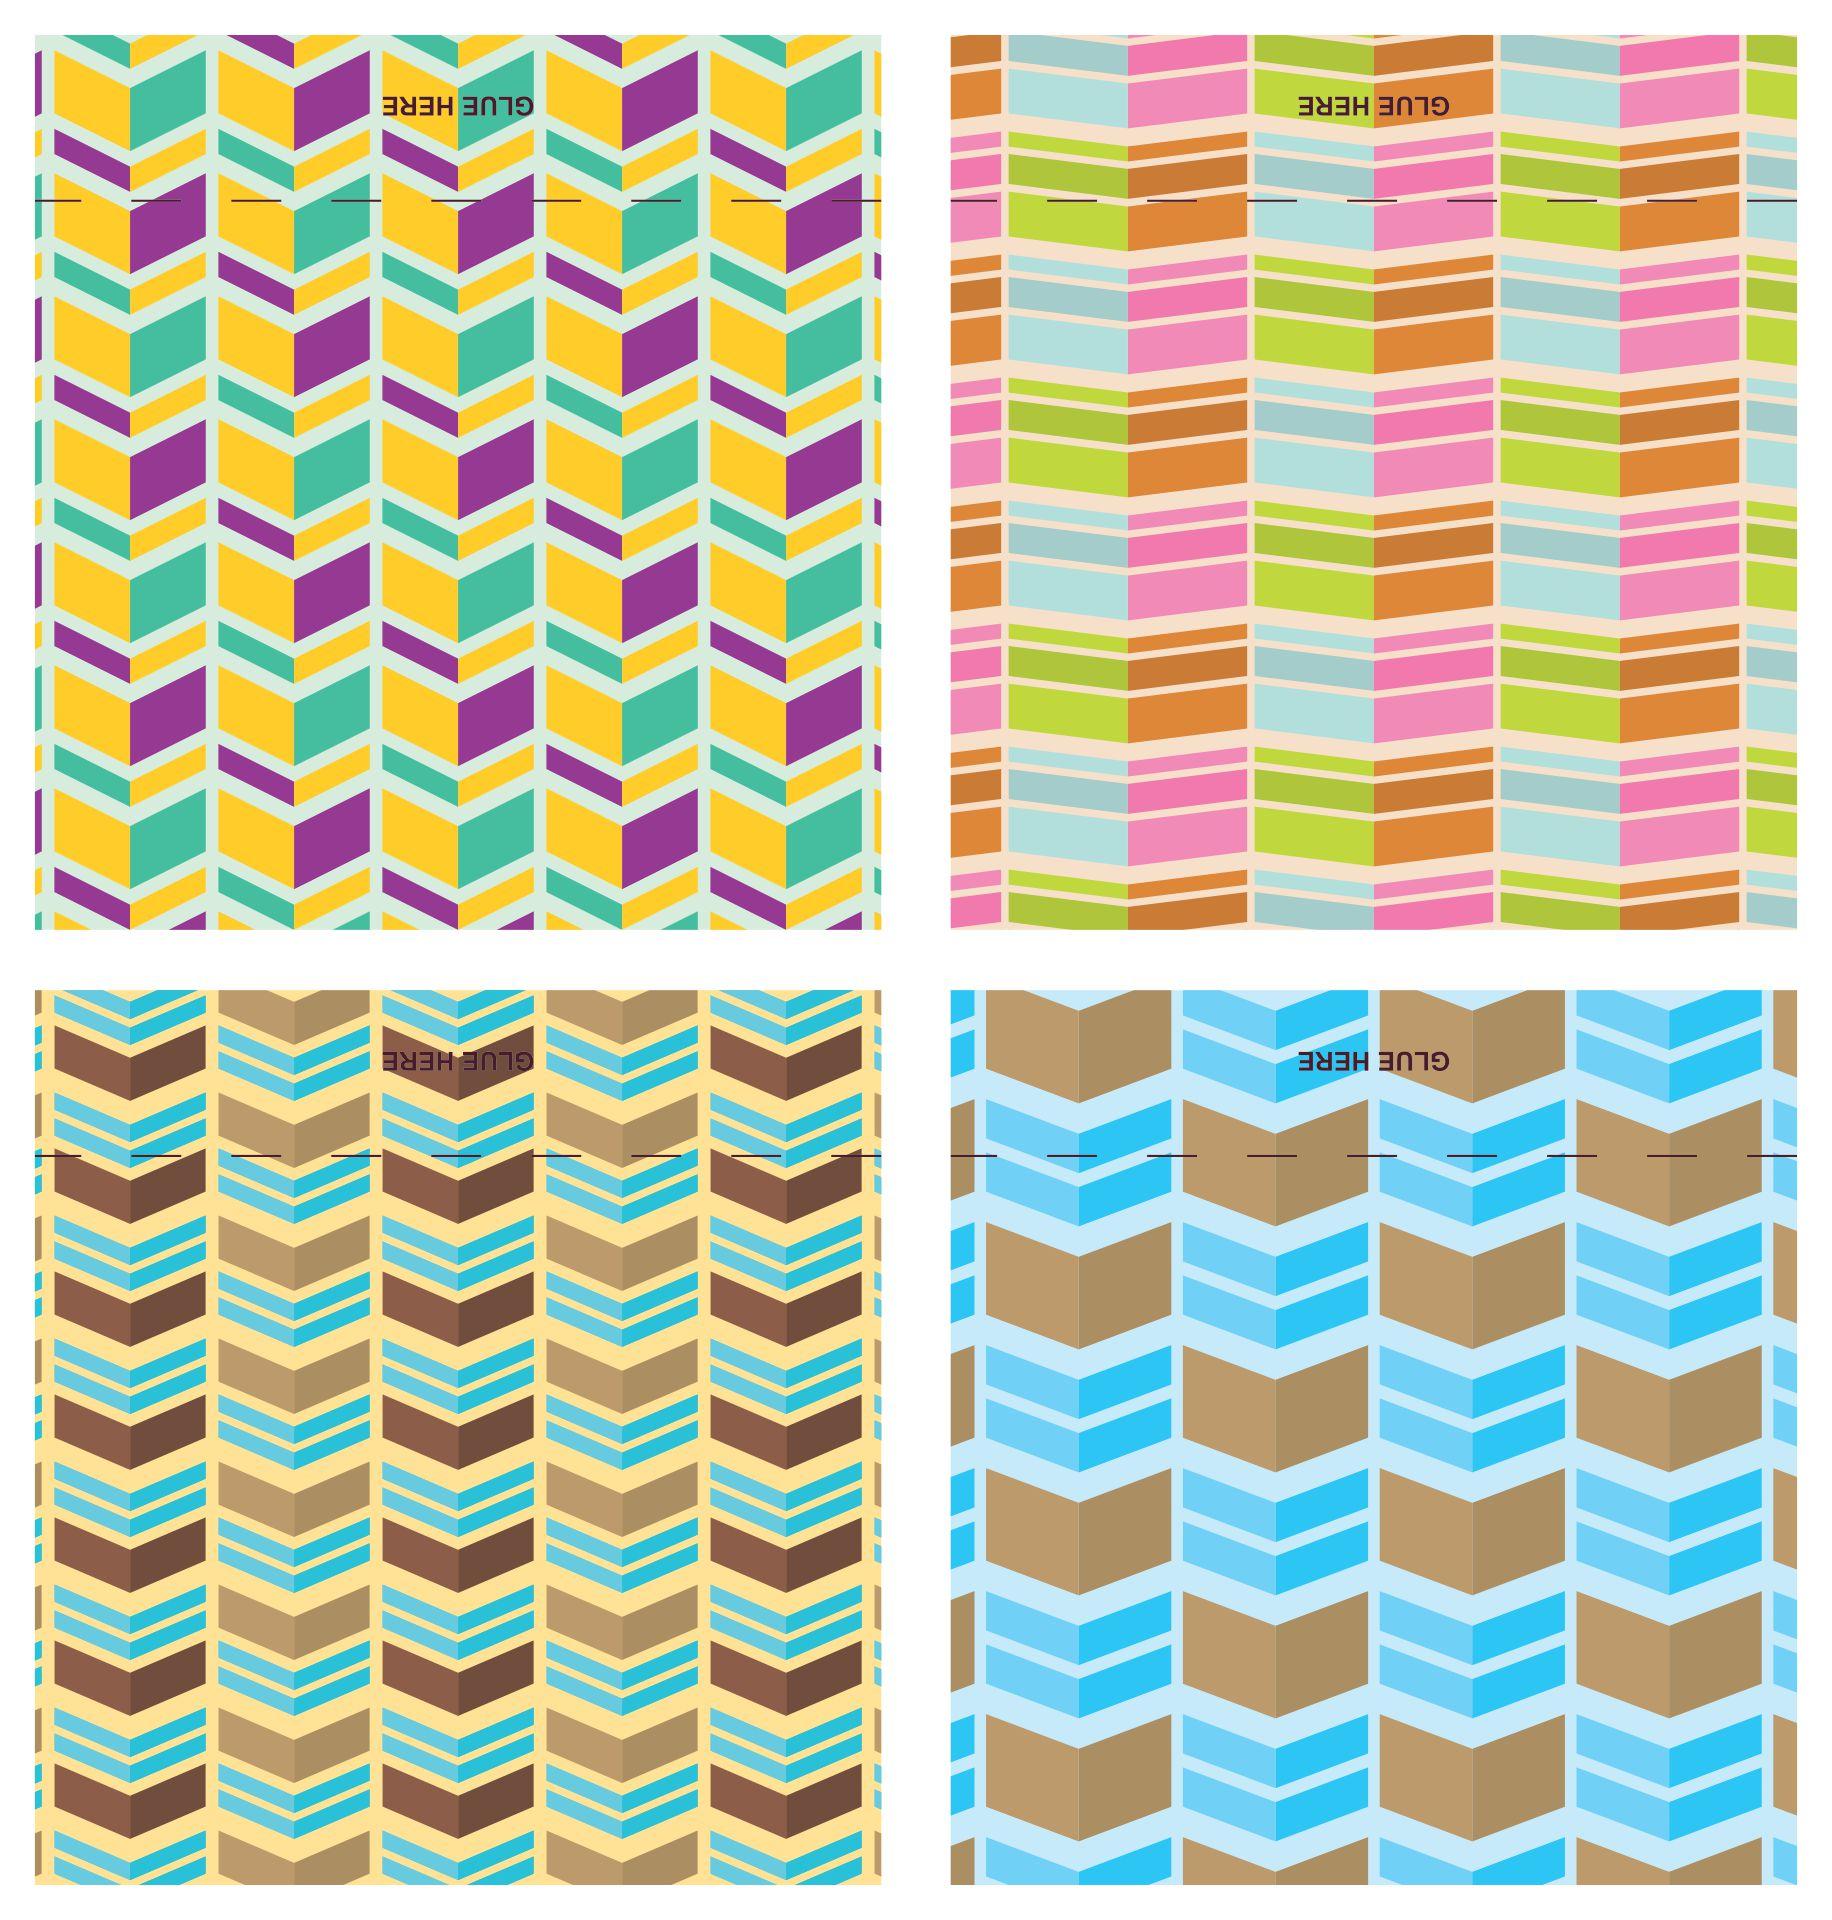 Customized Hershey Bar Wrapper Templates